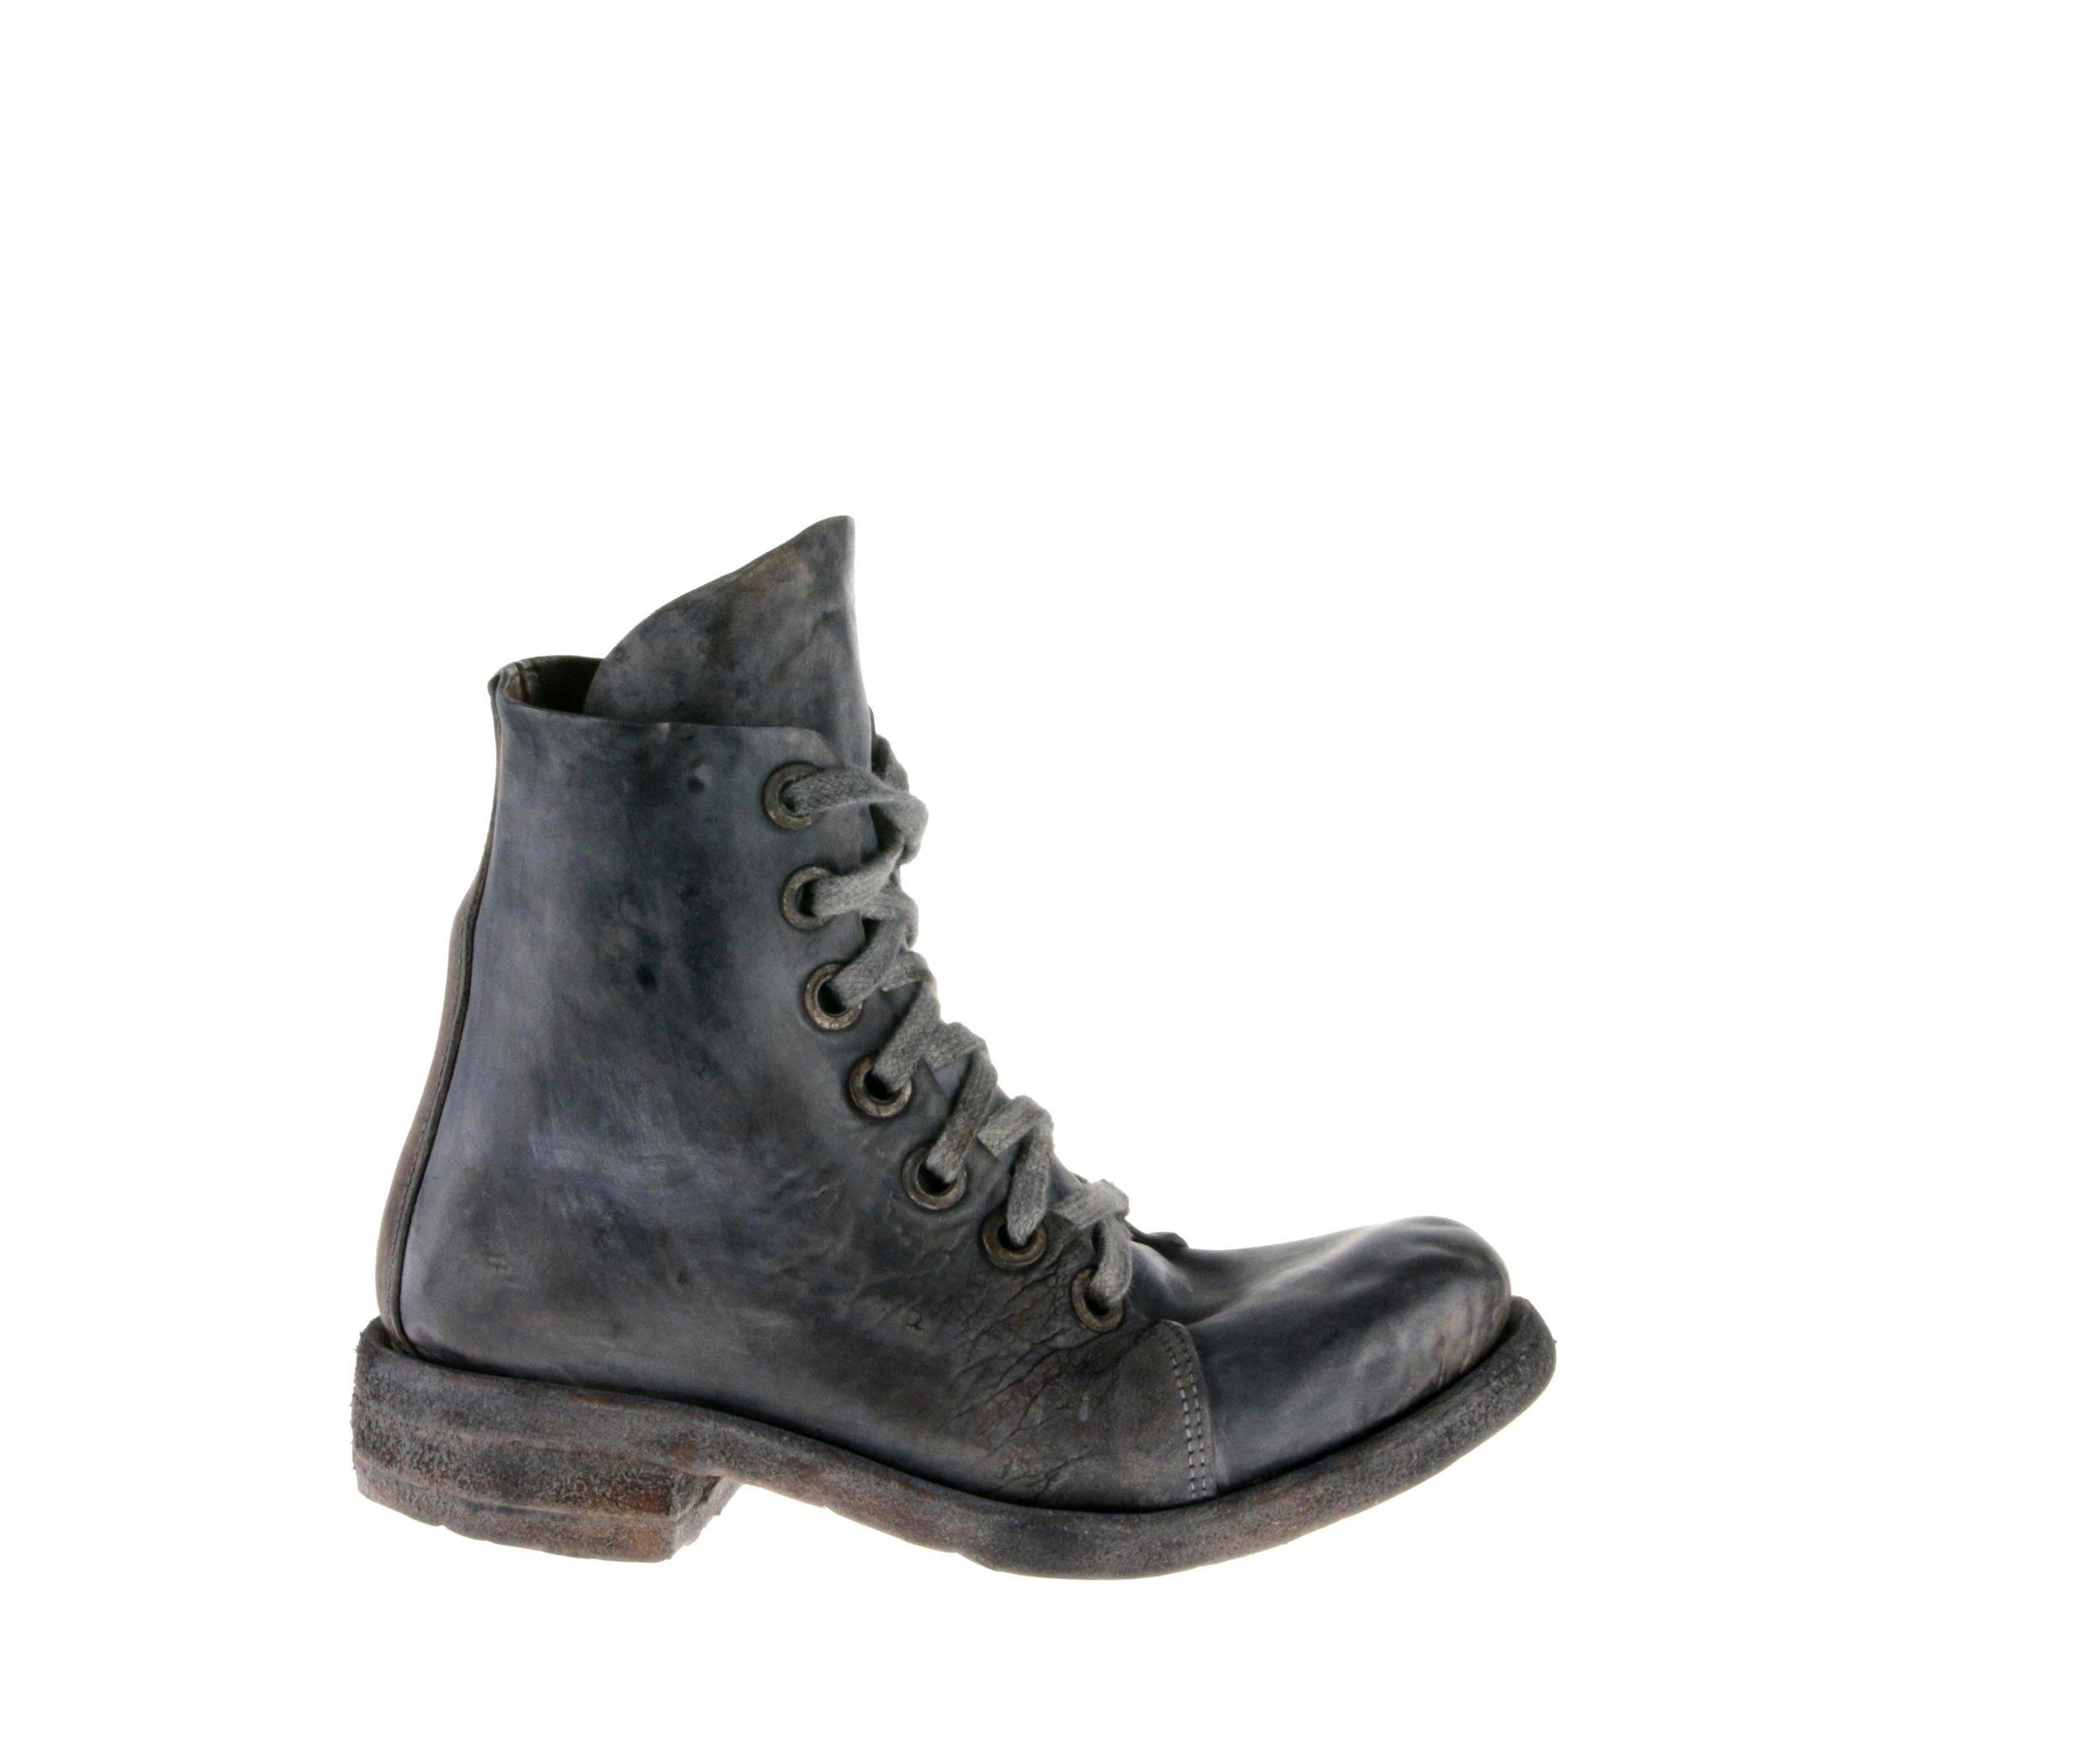 7Hole Boot Cordovan Light Grey